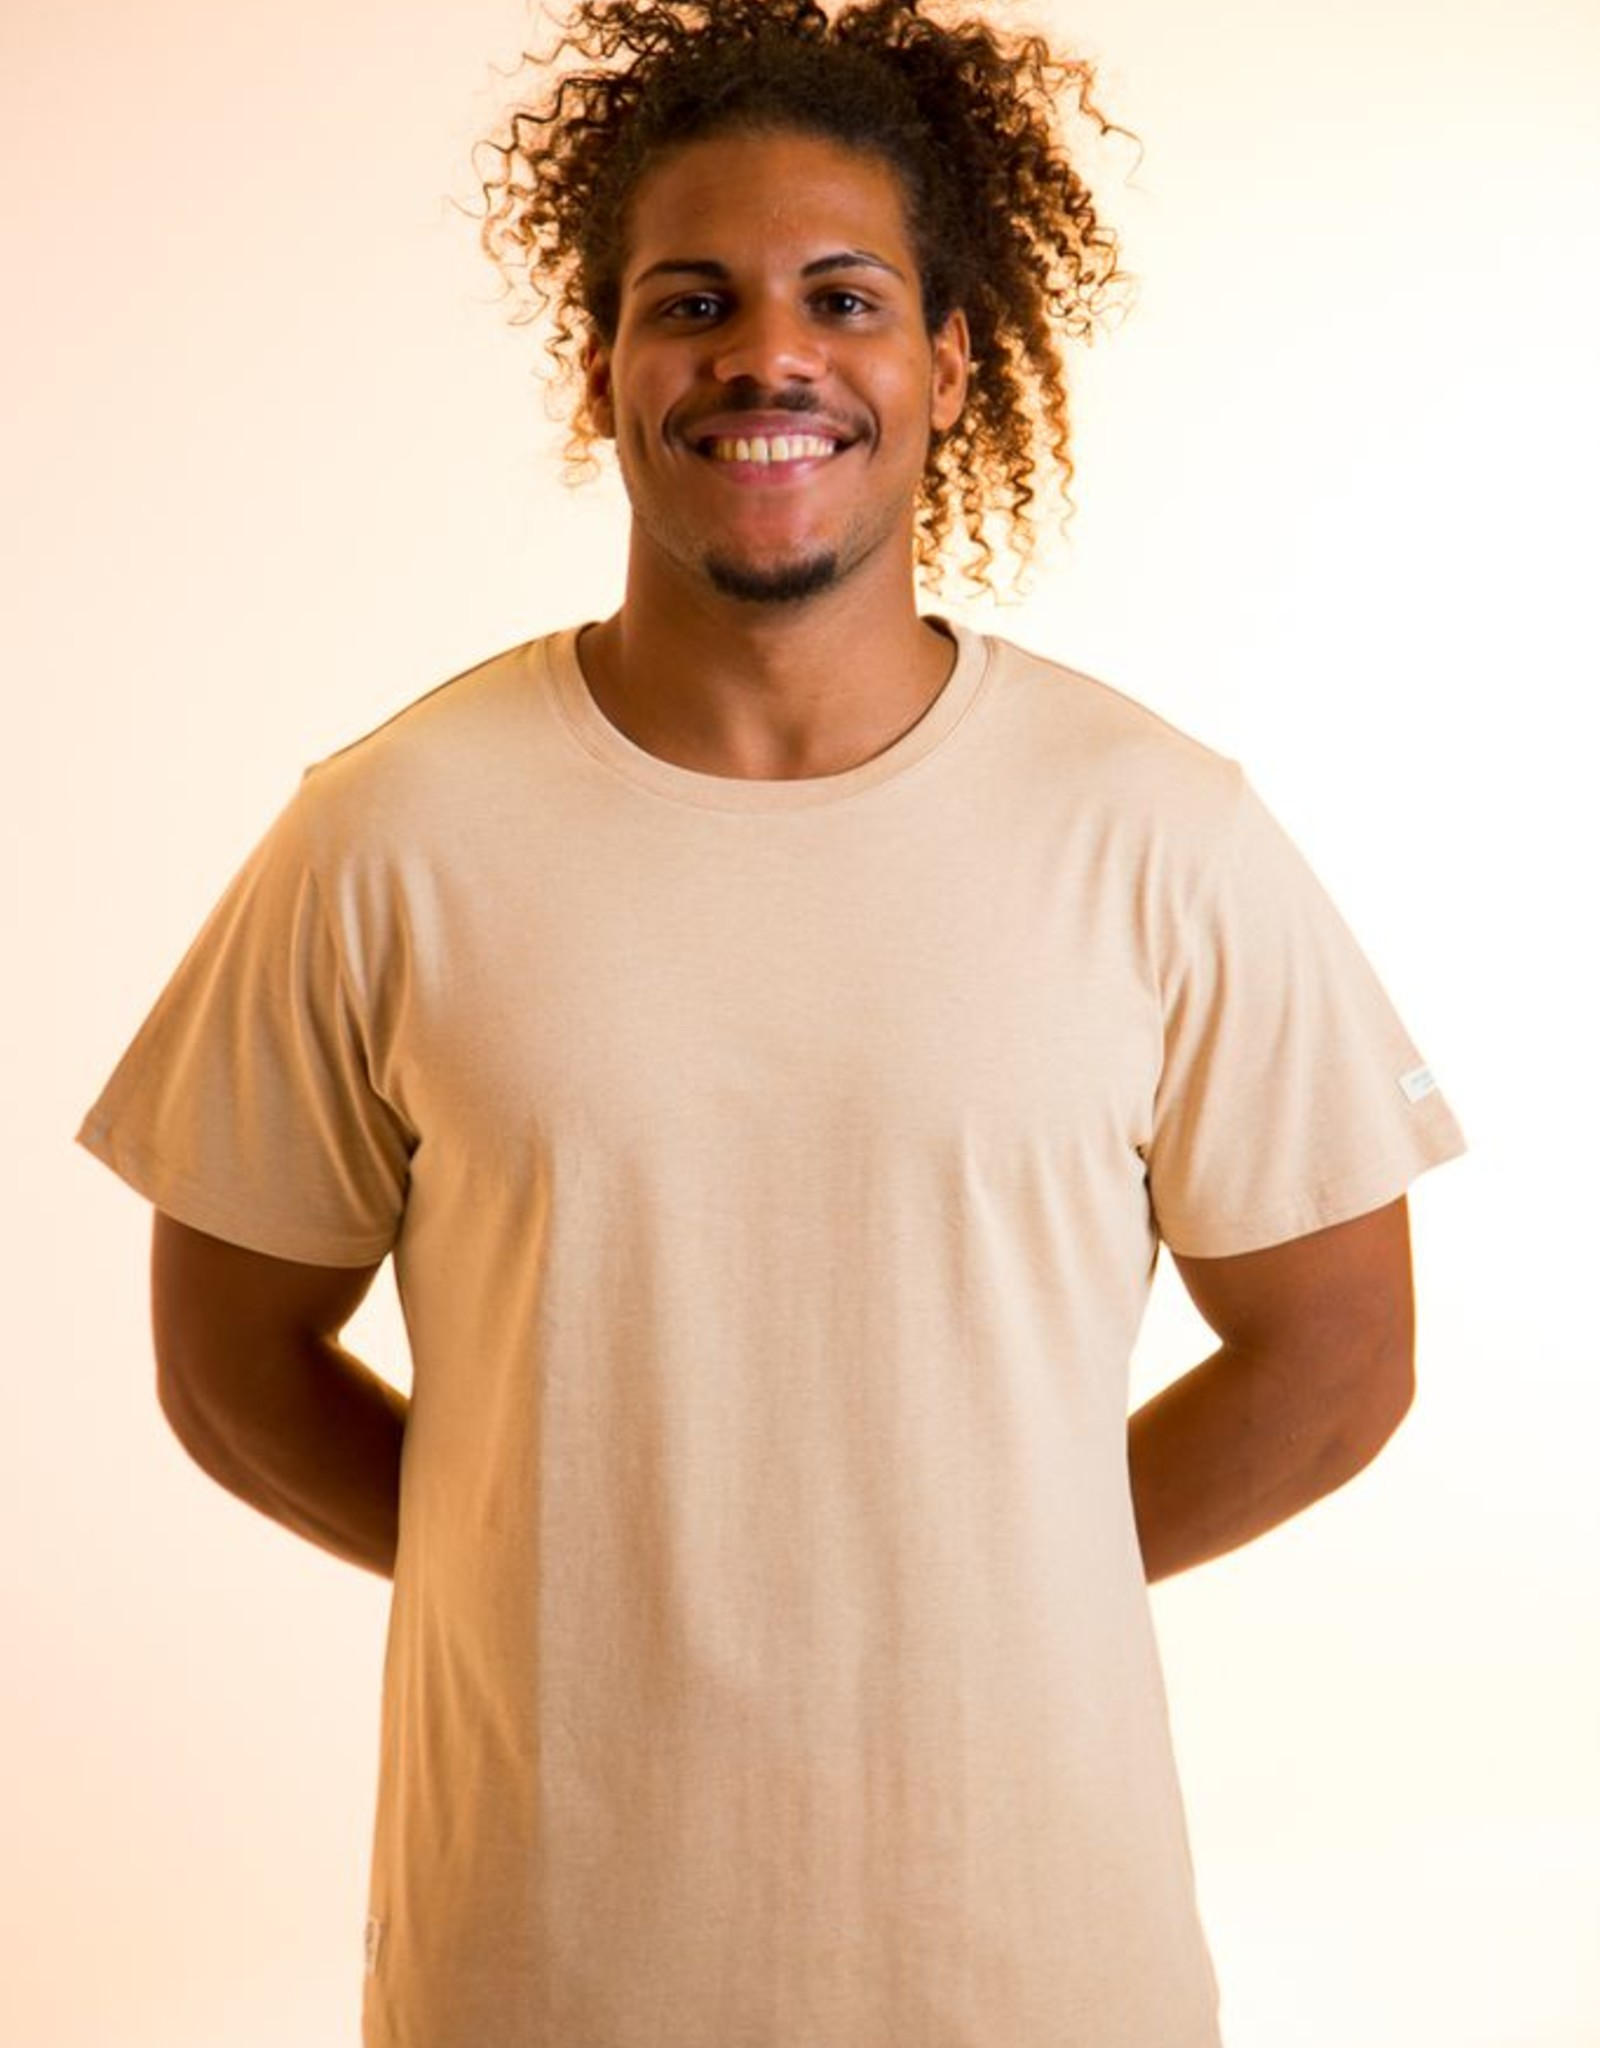 Camiseta hombre de manga corta.